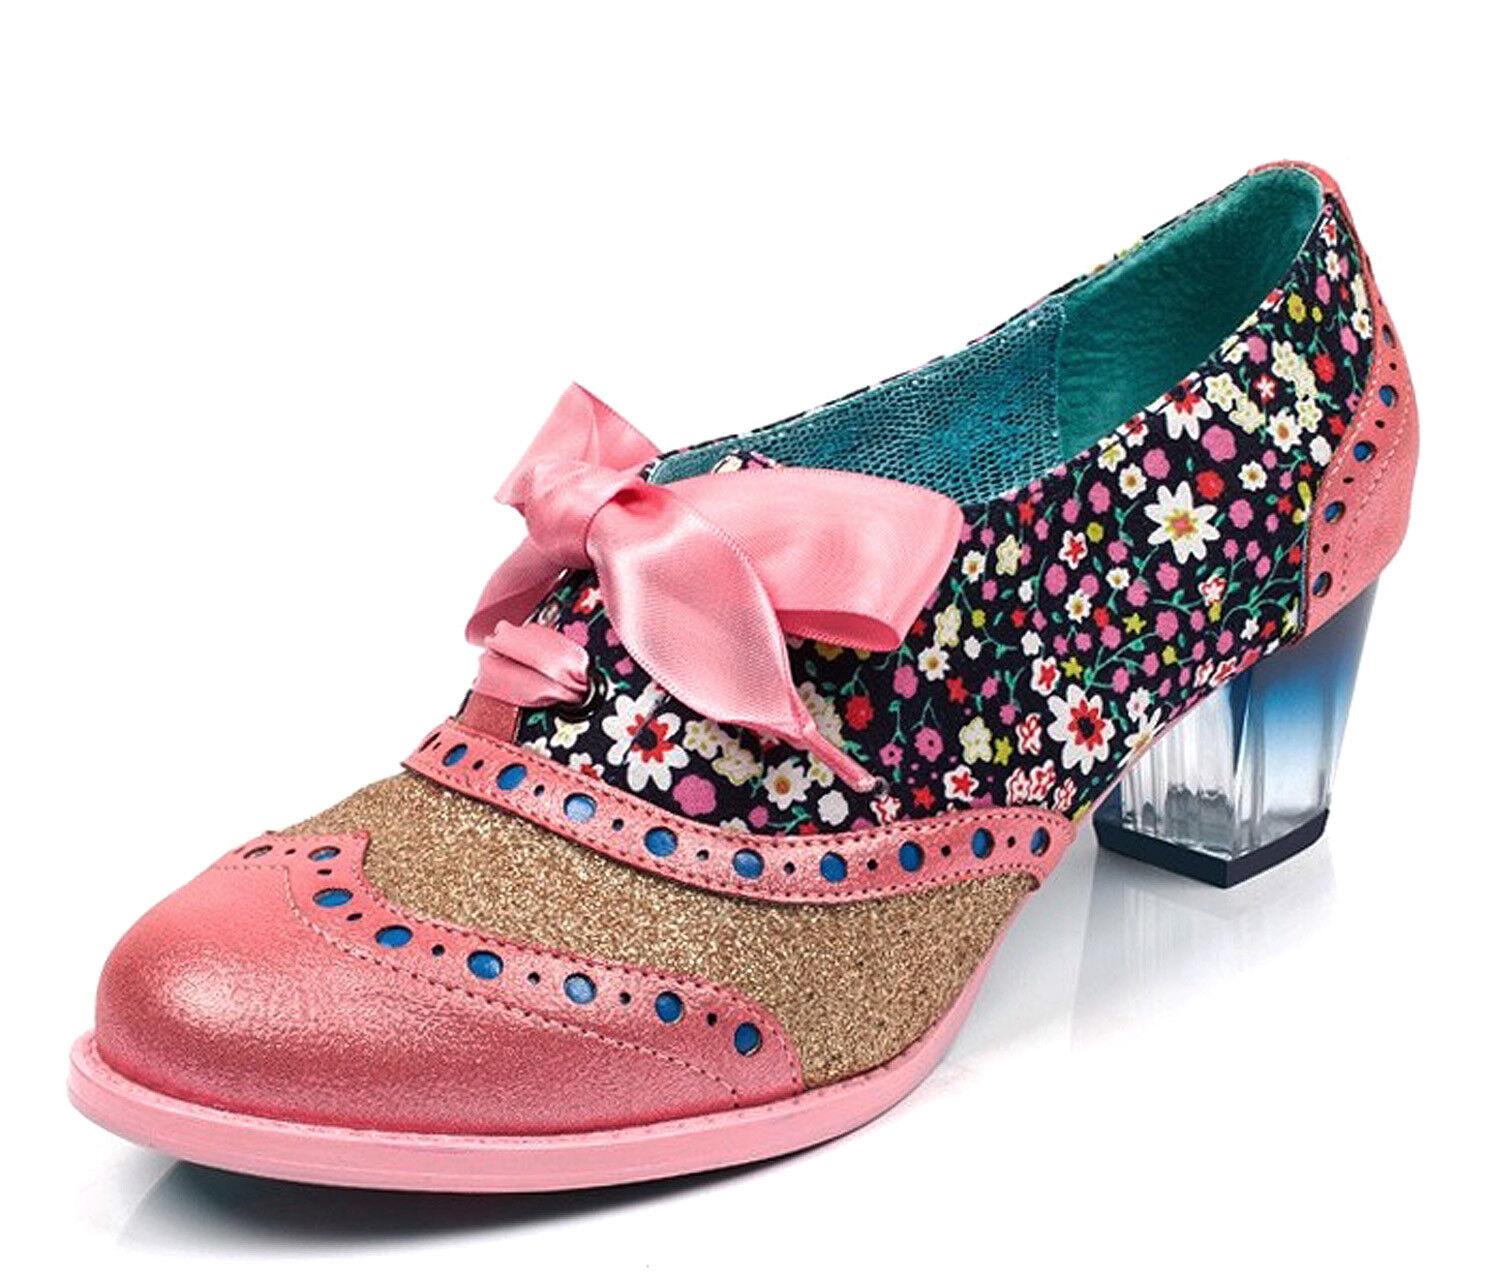 Licencia poética nuevo corporativo Belleza Belleza Belleza rosado Floral Talón Mediados Brogue Zapatos Tallas 3-9  garantizado